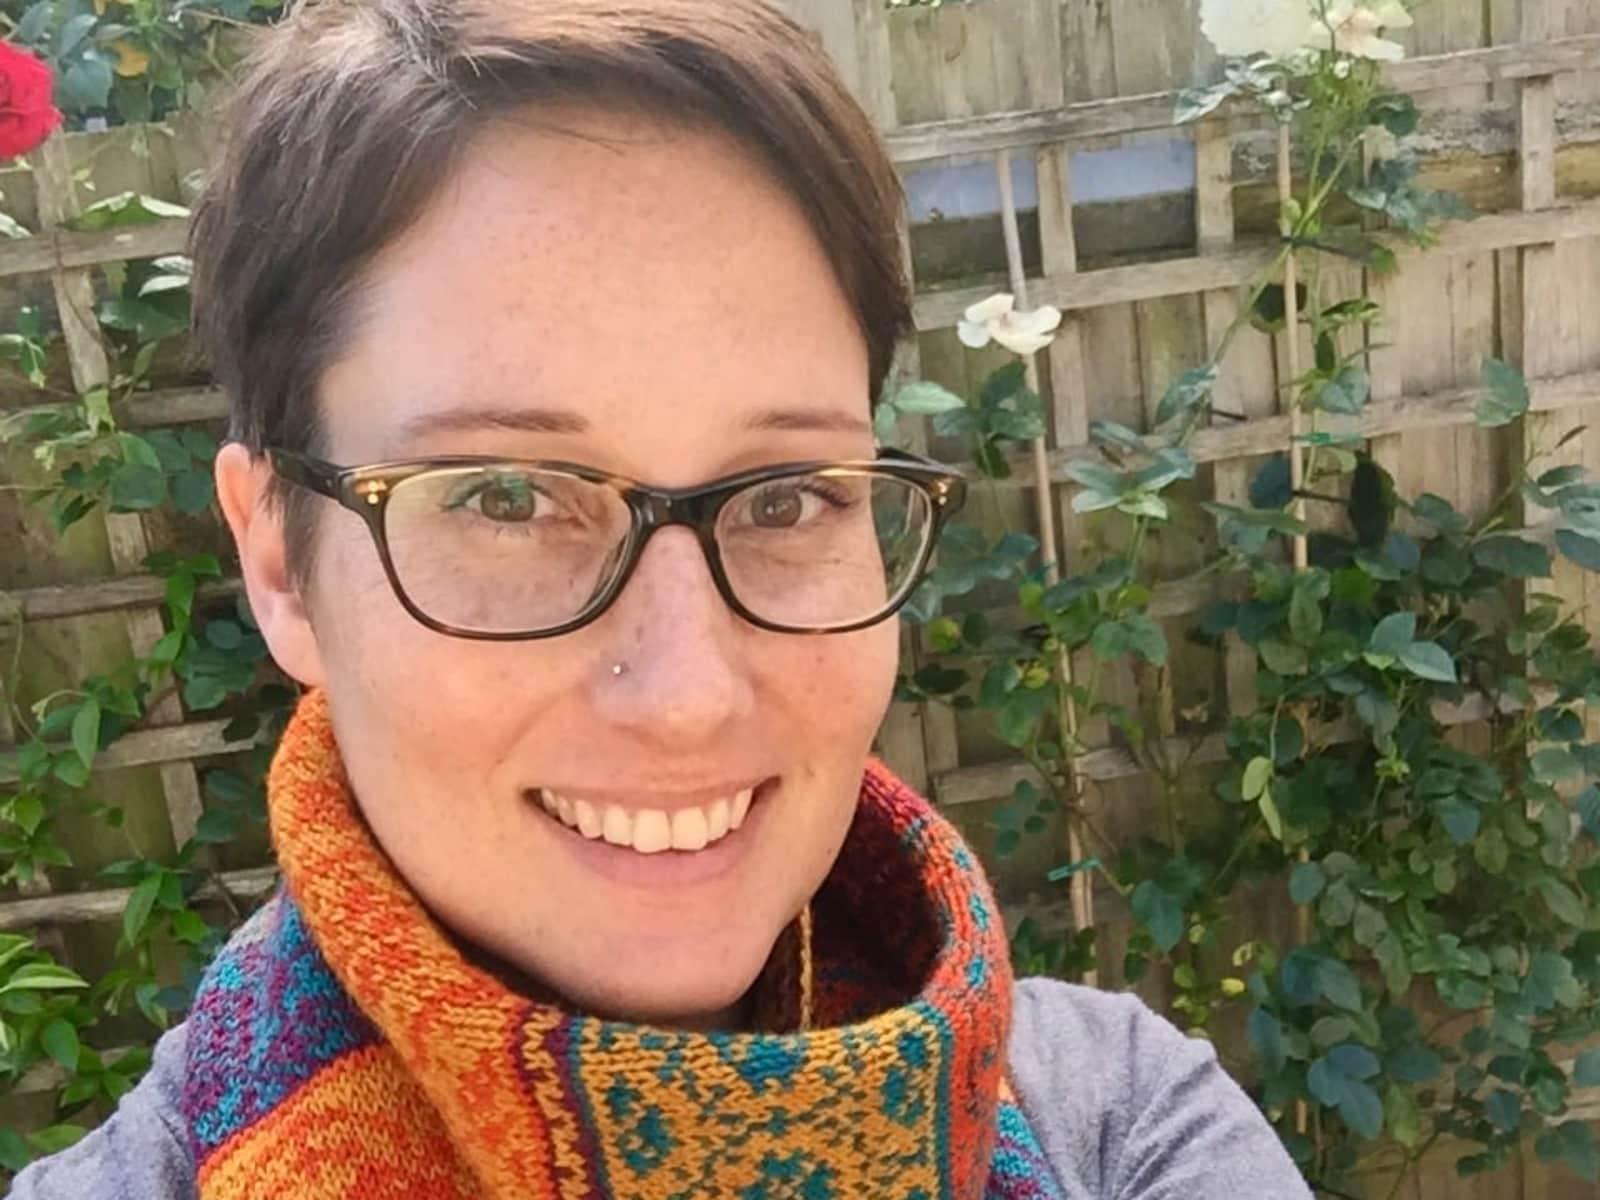 Larissa from London, United Kingdom